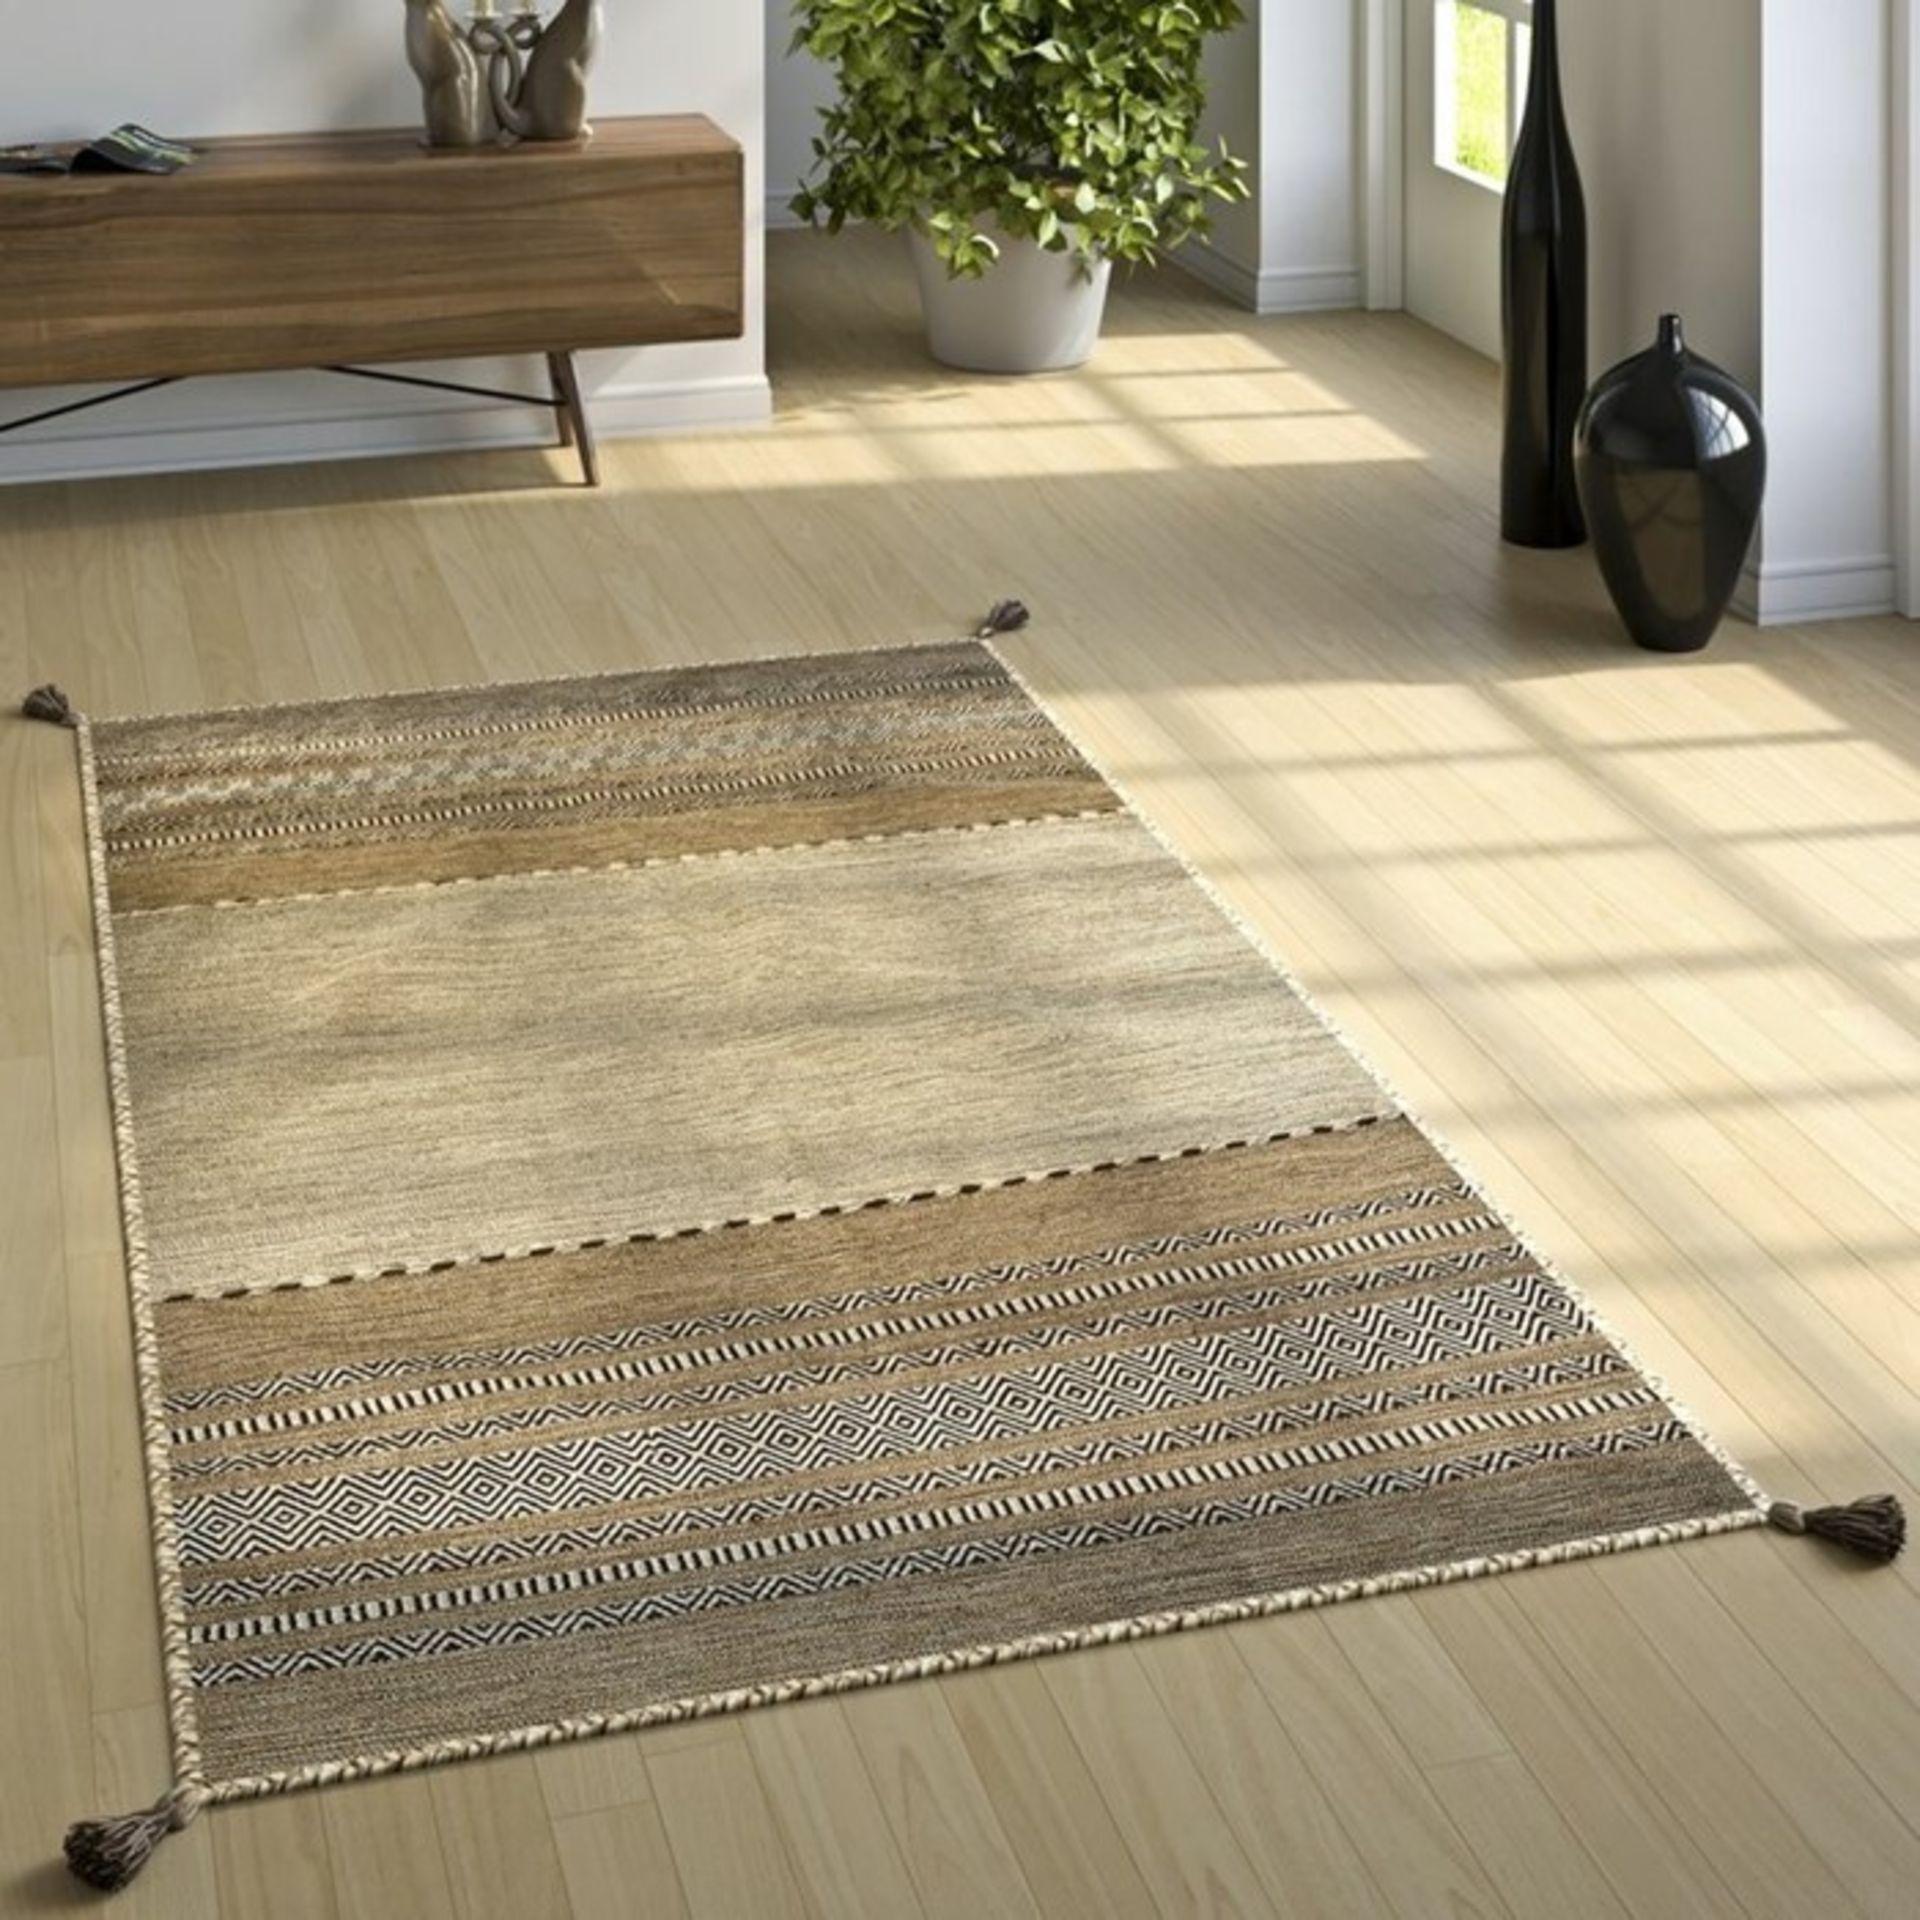 World Menagerie,Earby Handmade Kilim Cotton Beige Rug - RRP £57.99 (ALAS6620 -16899/30)